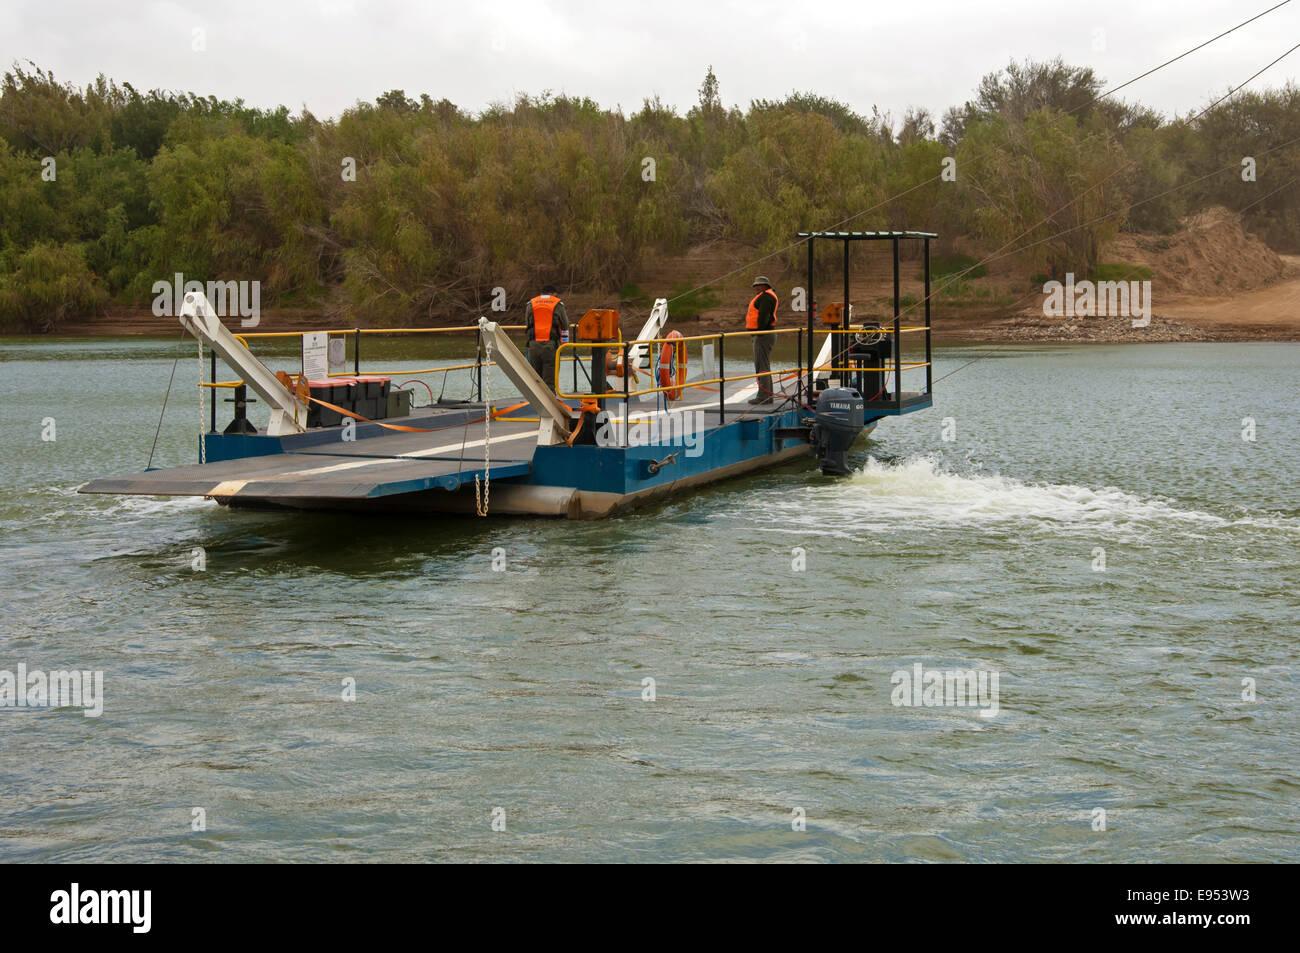 Octha ferry pontoon across the Orange River, crossing from South Africa to Namibia, Sendelingsdrif, Richtersveld, - Stock Image